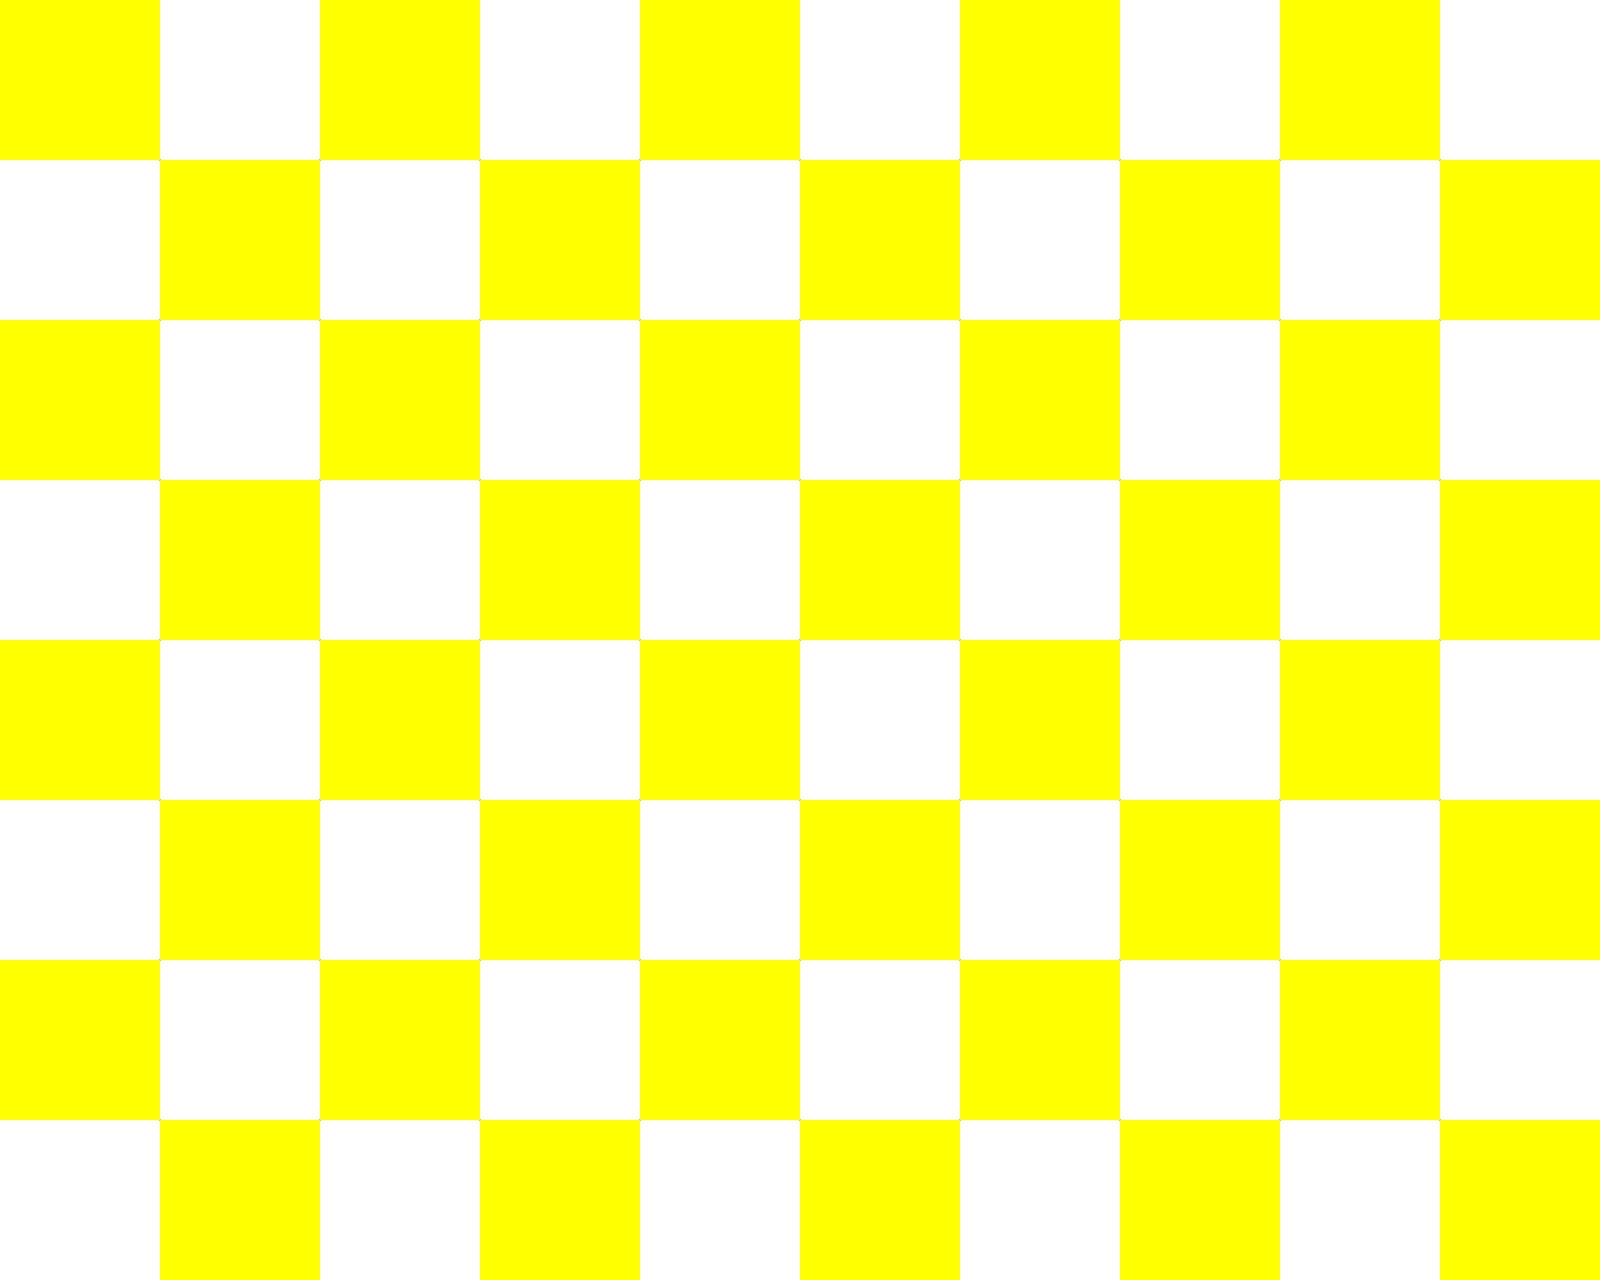 Checkered Wallpaper Yellow Png 1600x1280 Tumblr